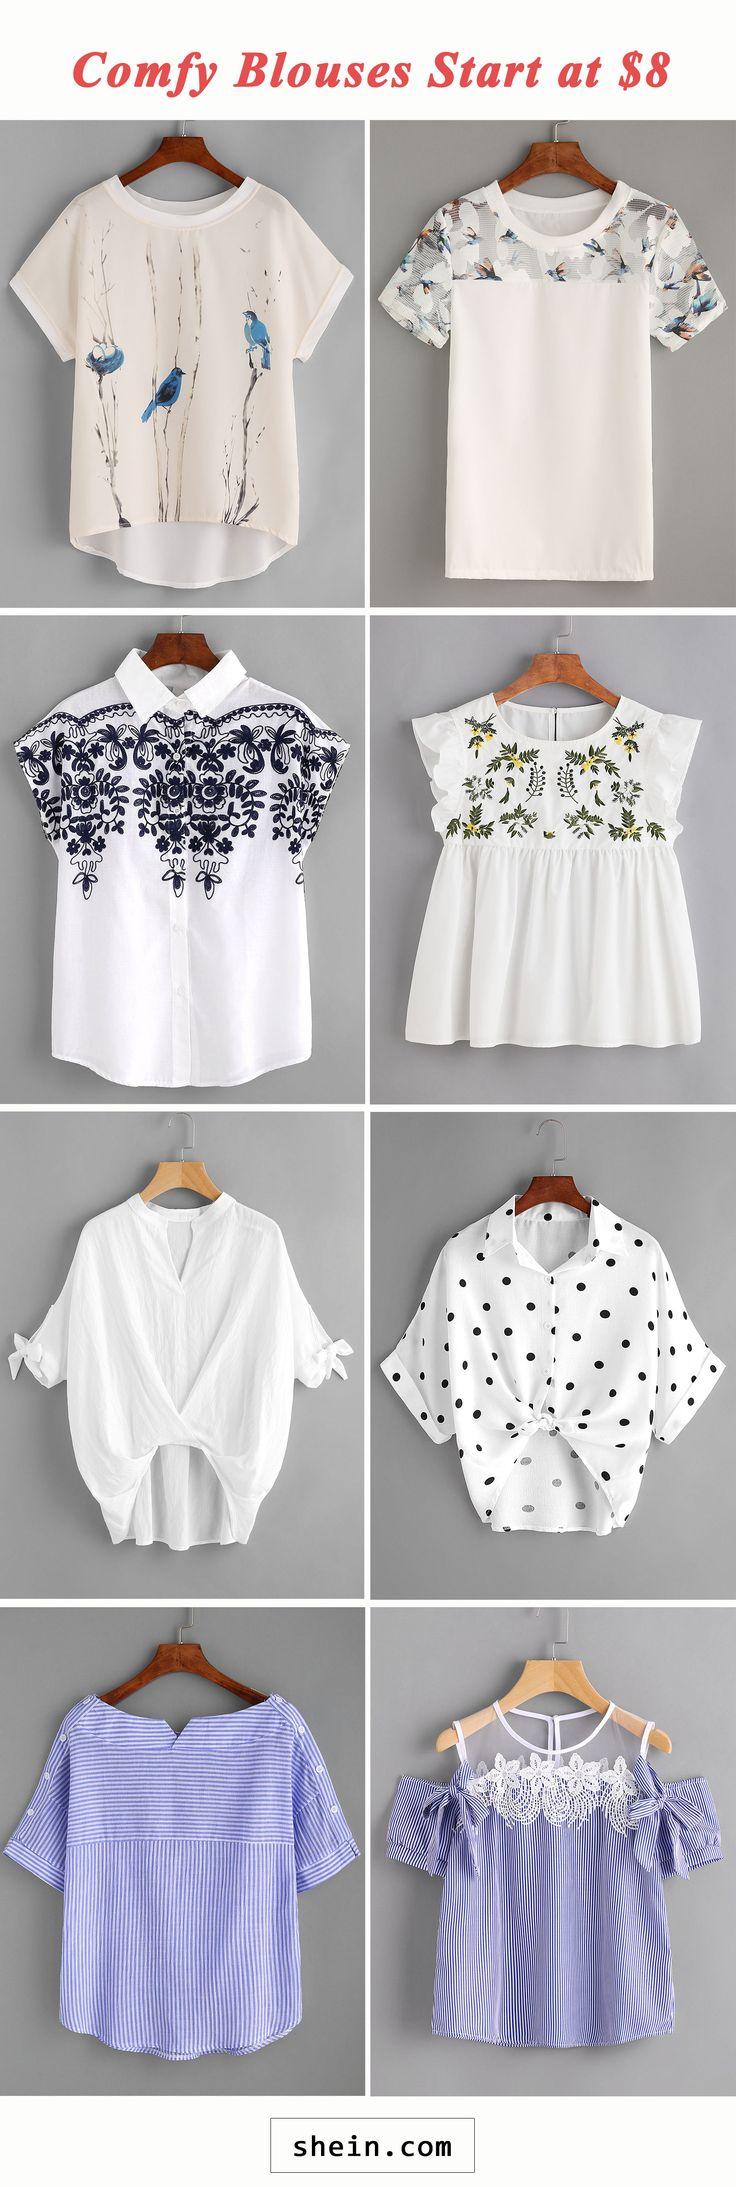 Comfy blouses start at $8!